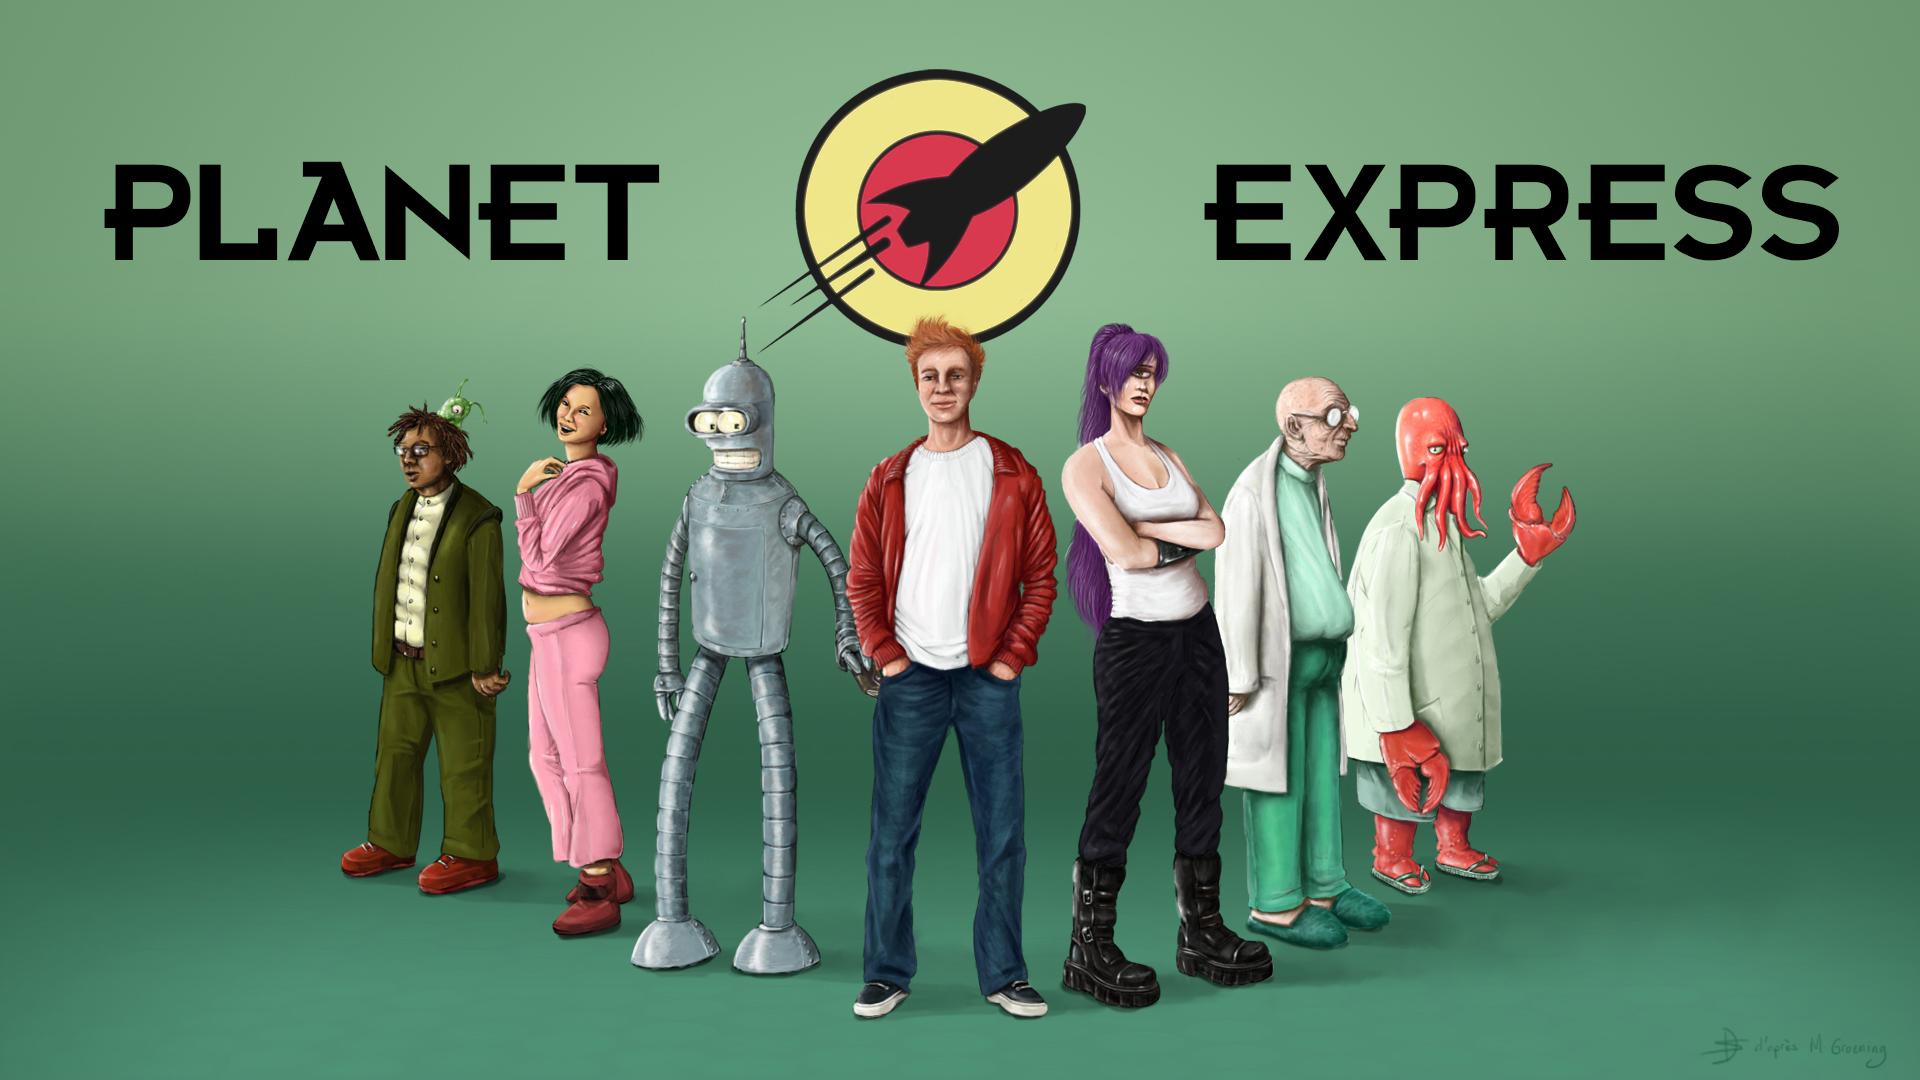 https://fc05.deviantart.net/fs71/f/2012/266/c/1/futurama_fanart___planet_express_team_by_sebdus-d5fmtos.jpg